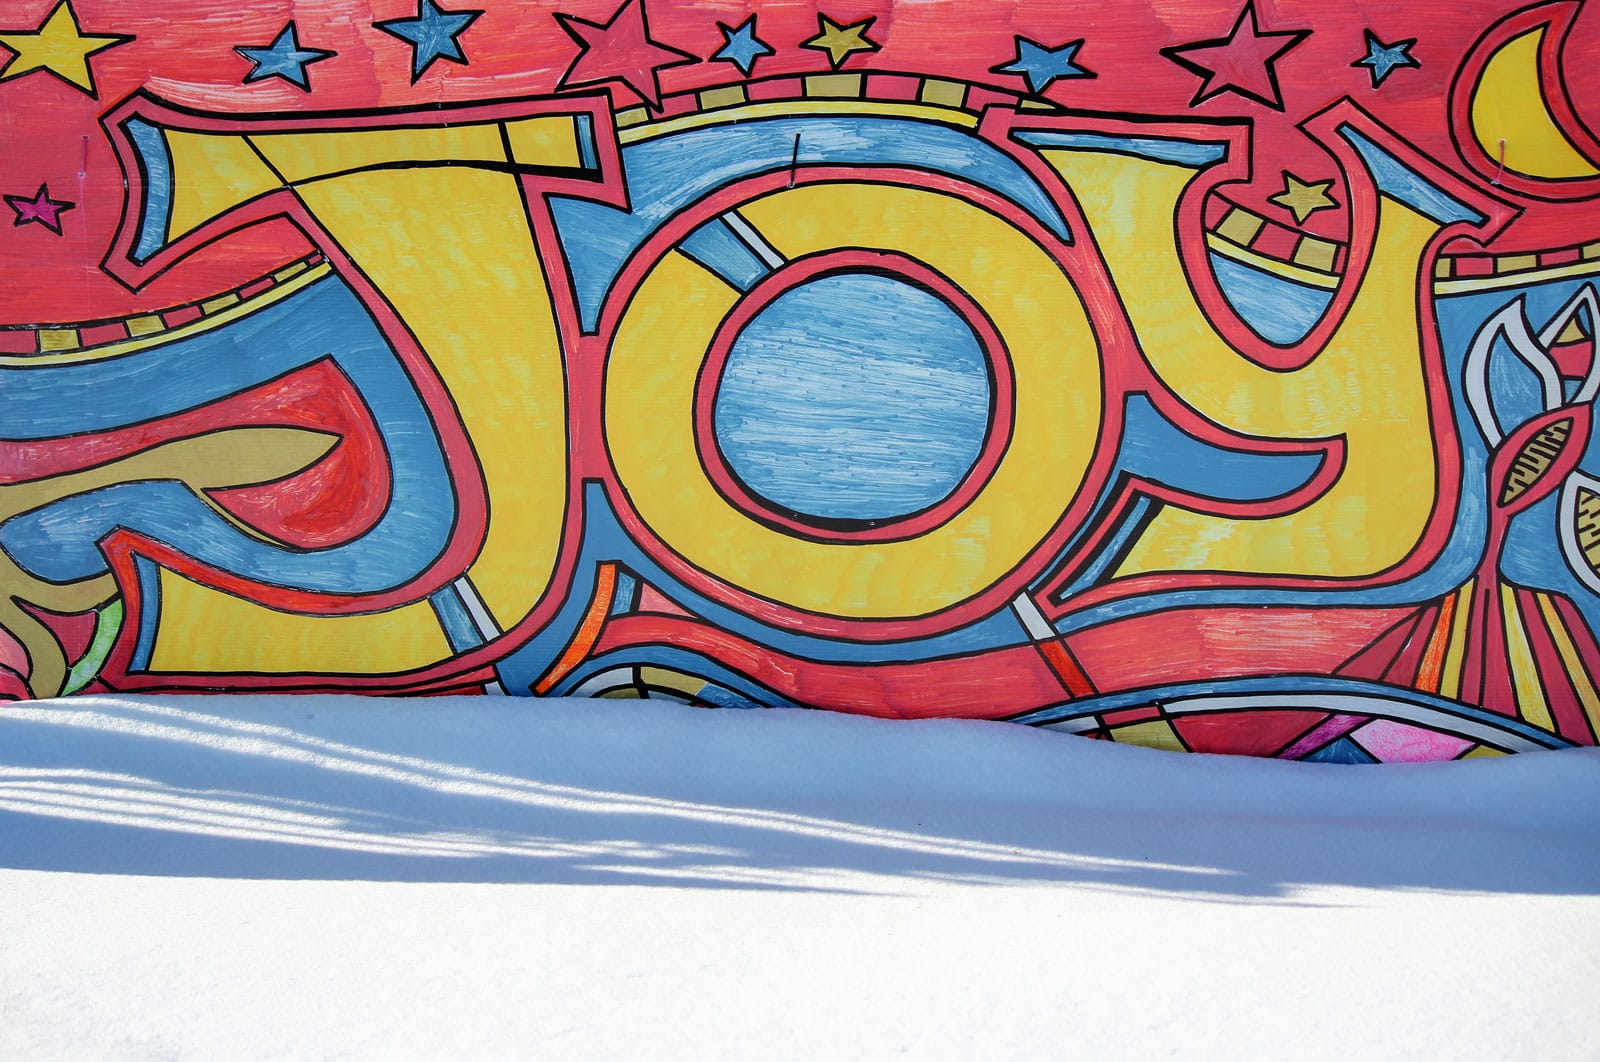 Joy - Sign at Stittsville United Church